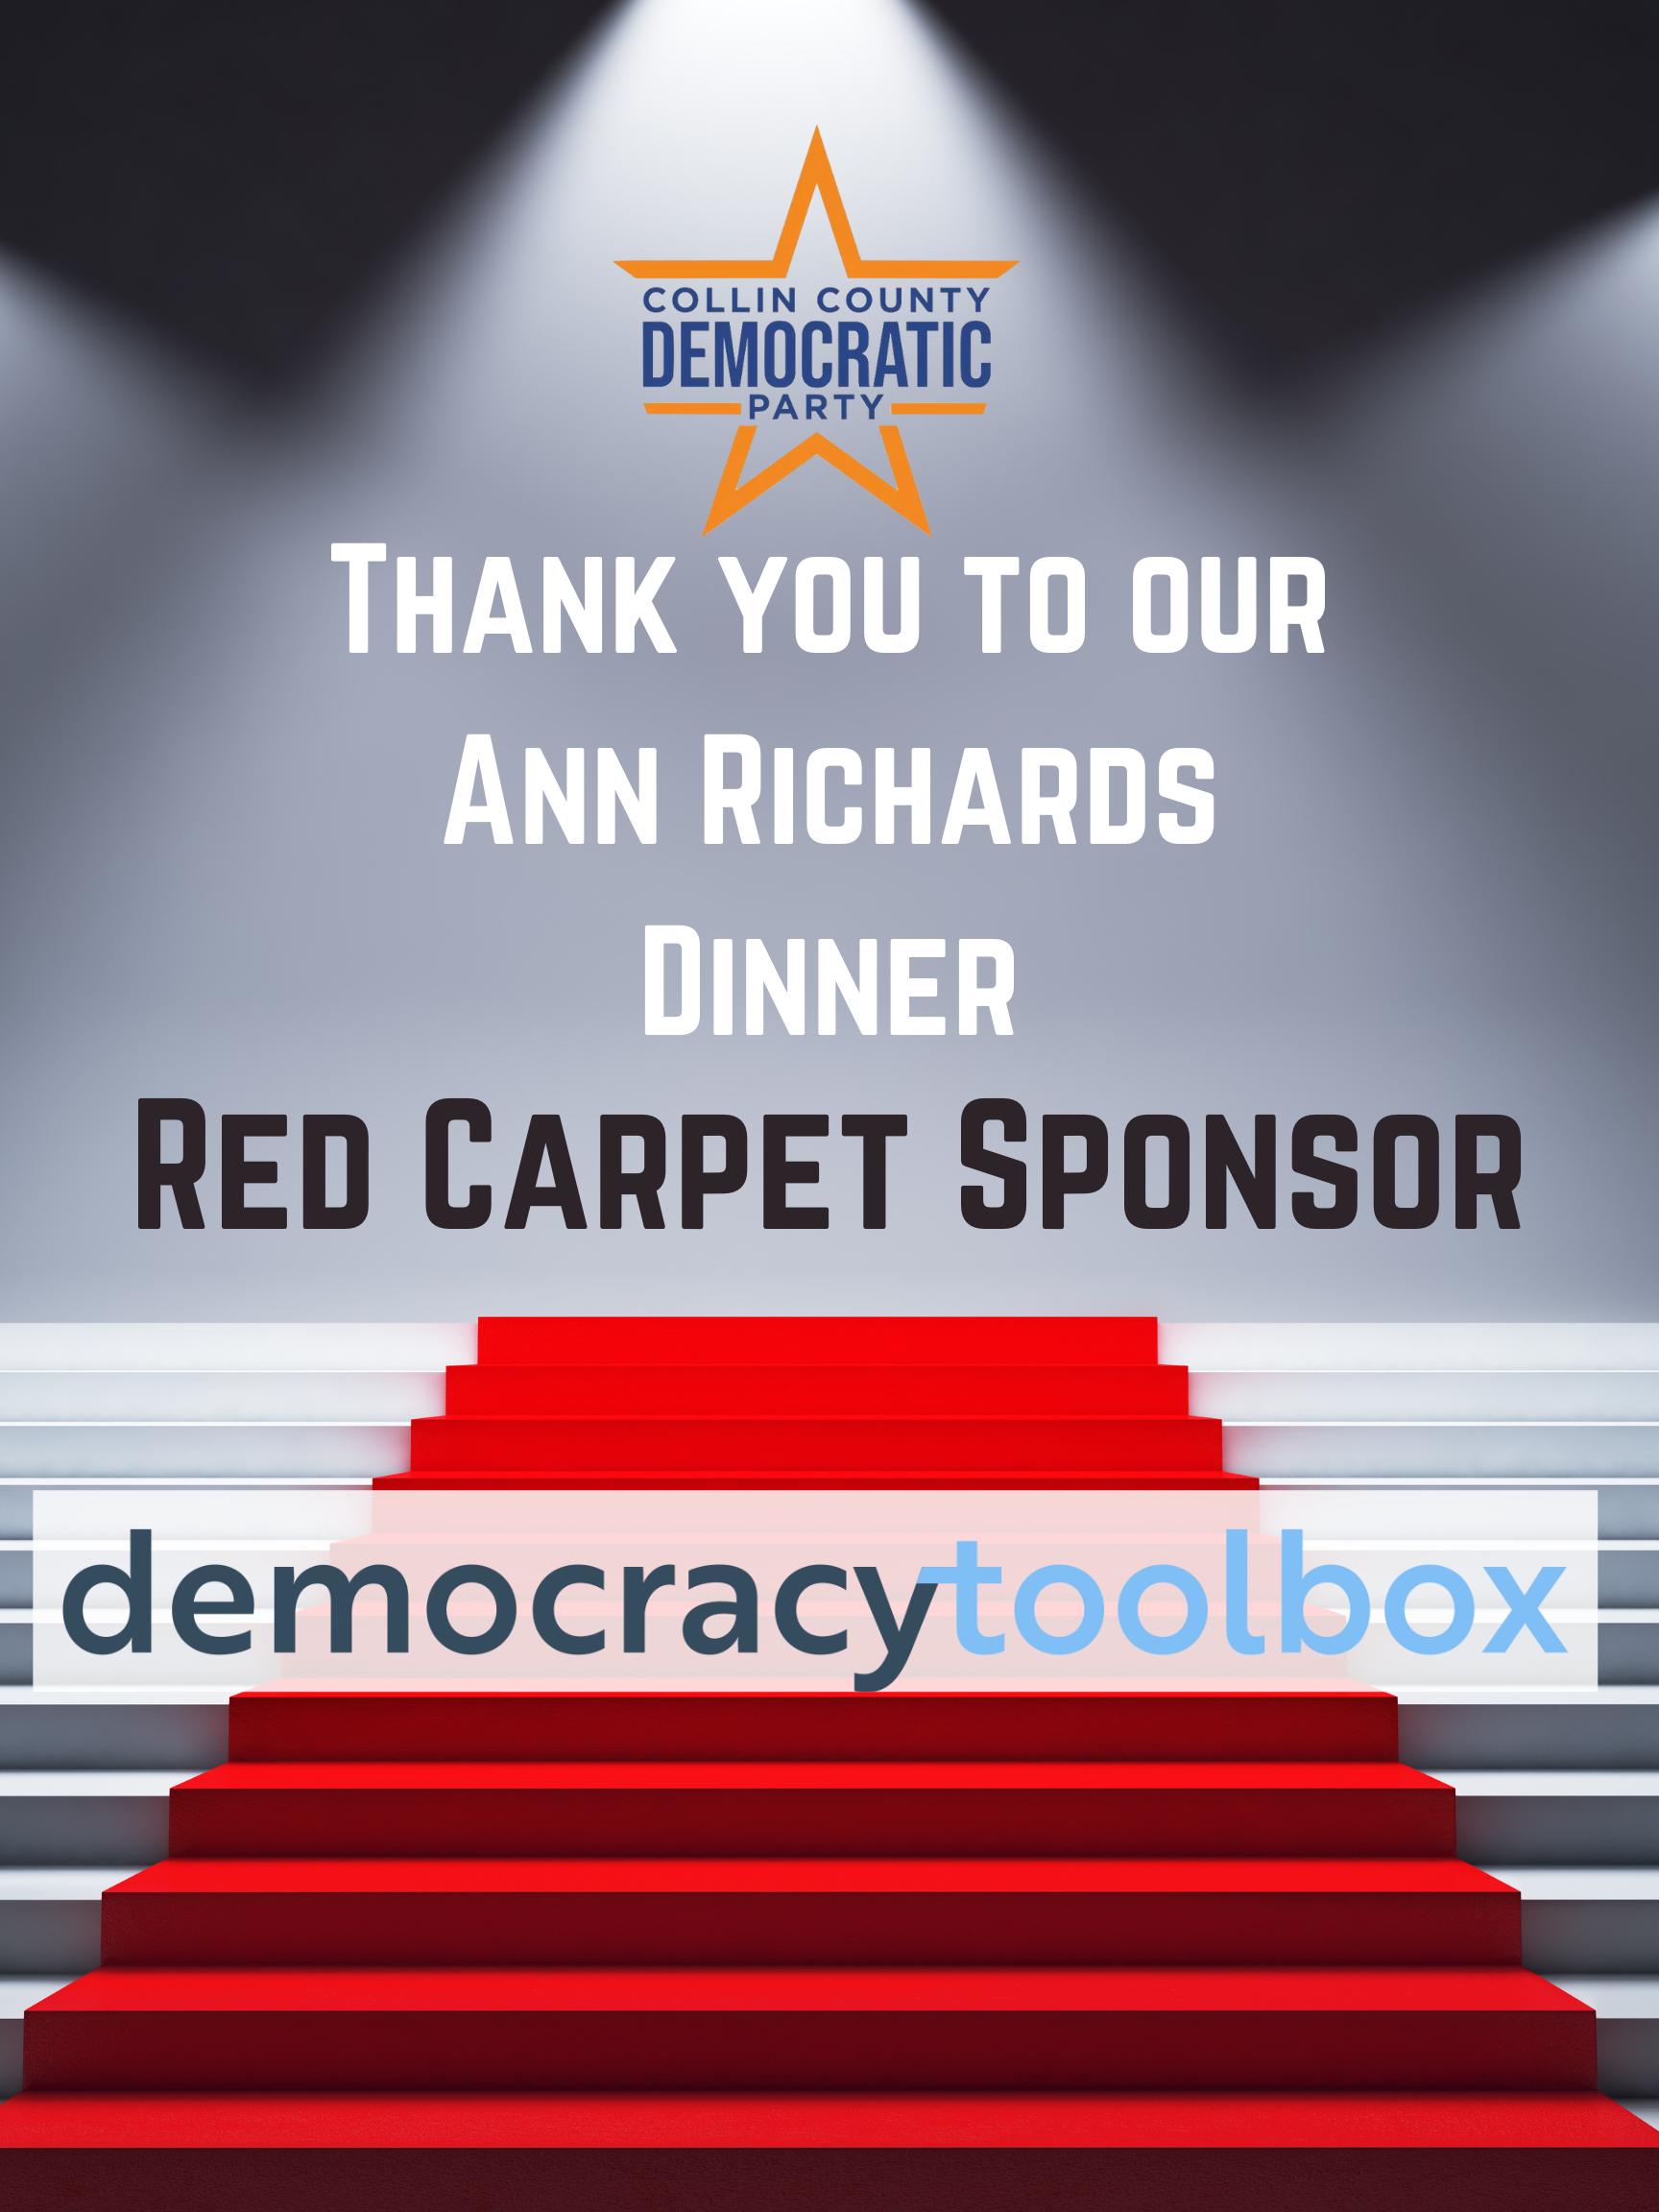 2021 ARD Red Carpet Sponsor democracytoolbox